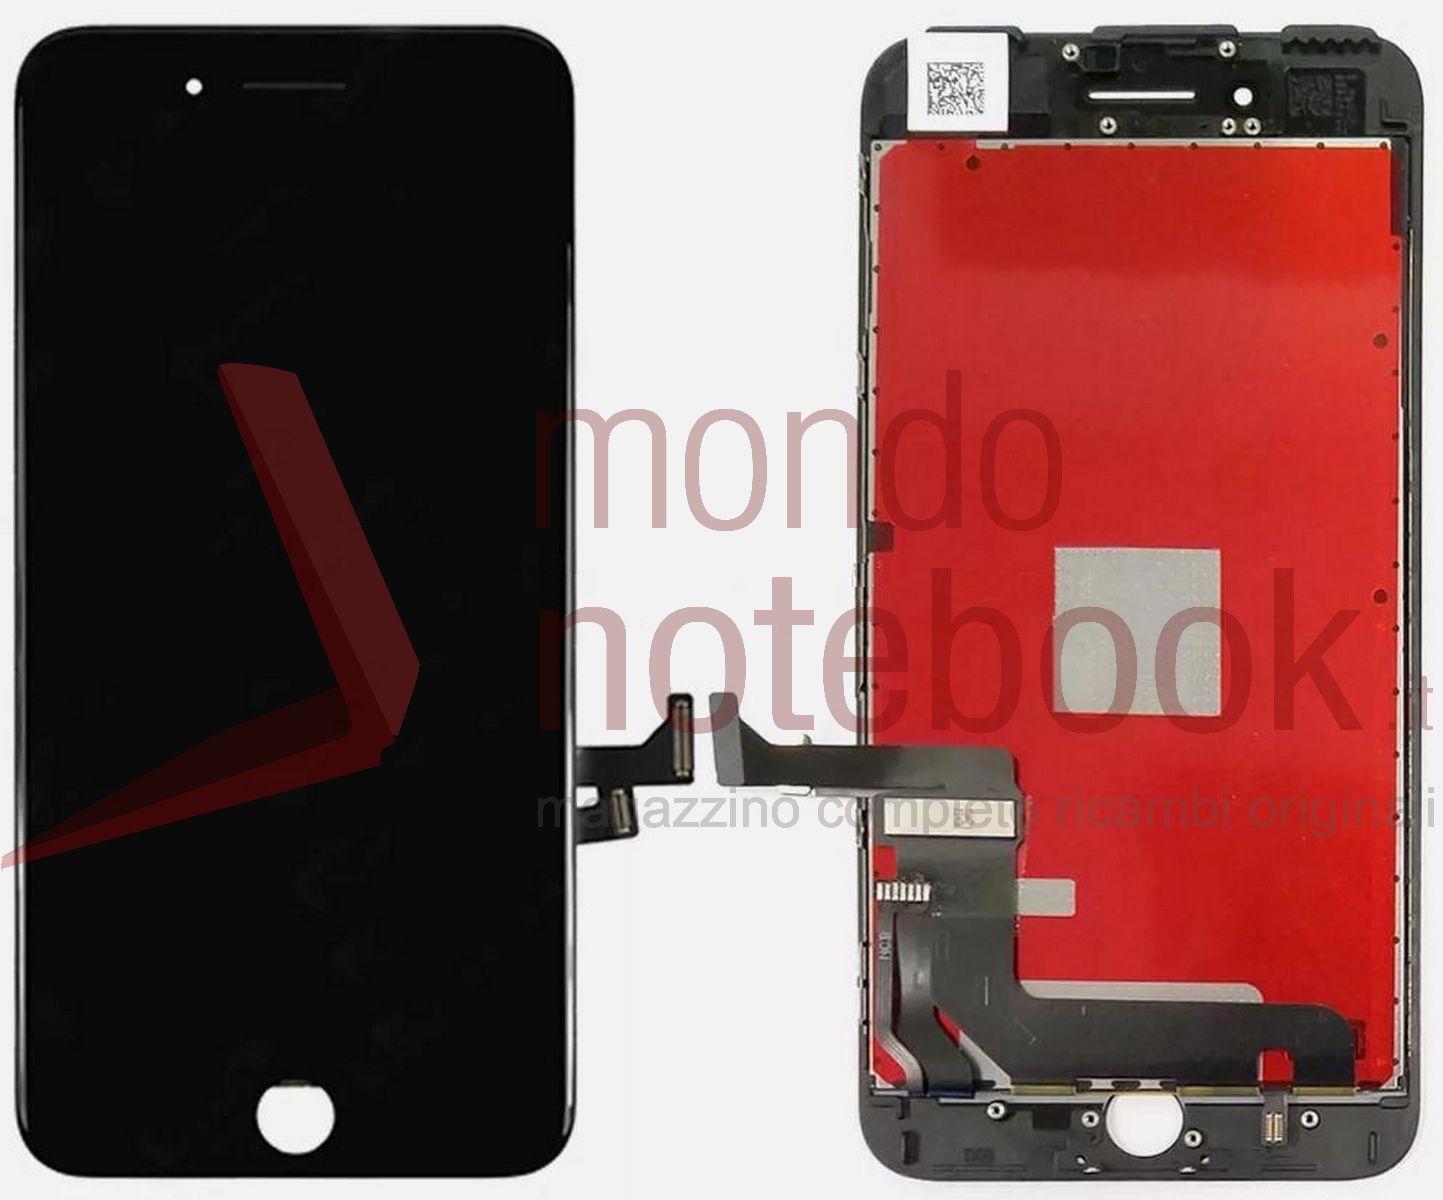 https://www.mondonotebook.it/7570/display-lcd-con-touch-screen-compatibile-per-apple-iphone-7-plus-nero-a-.jpg